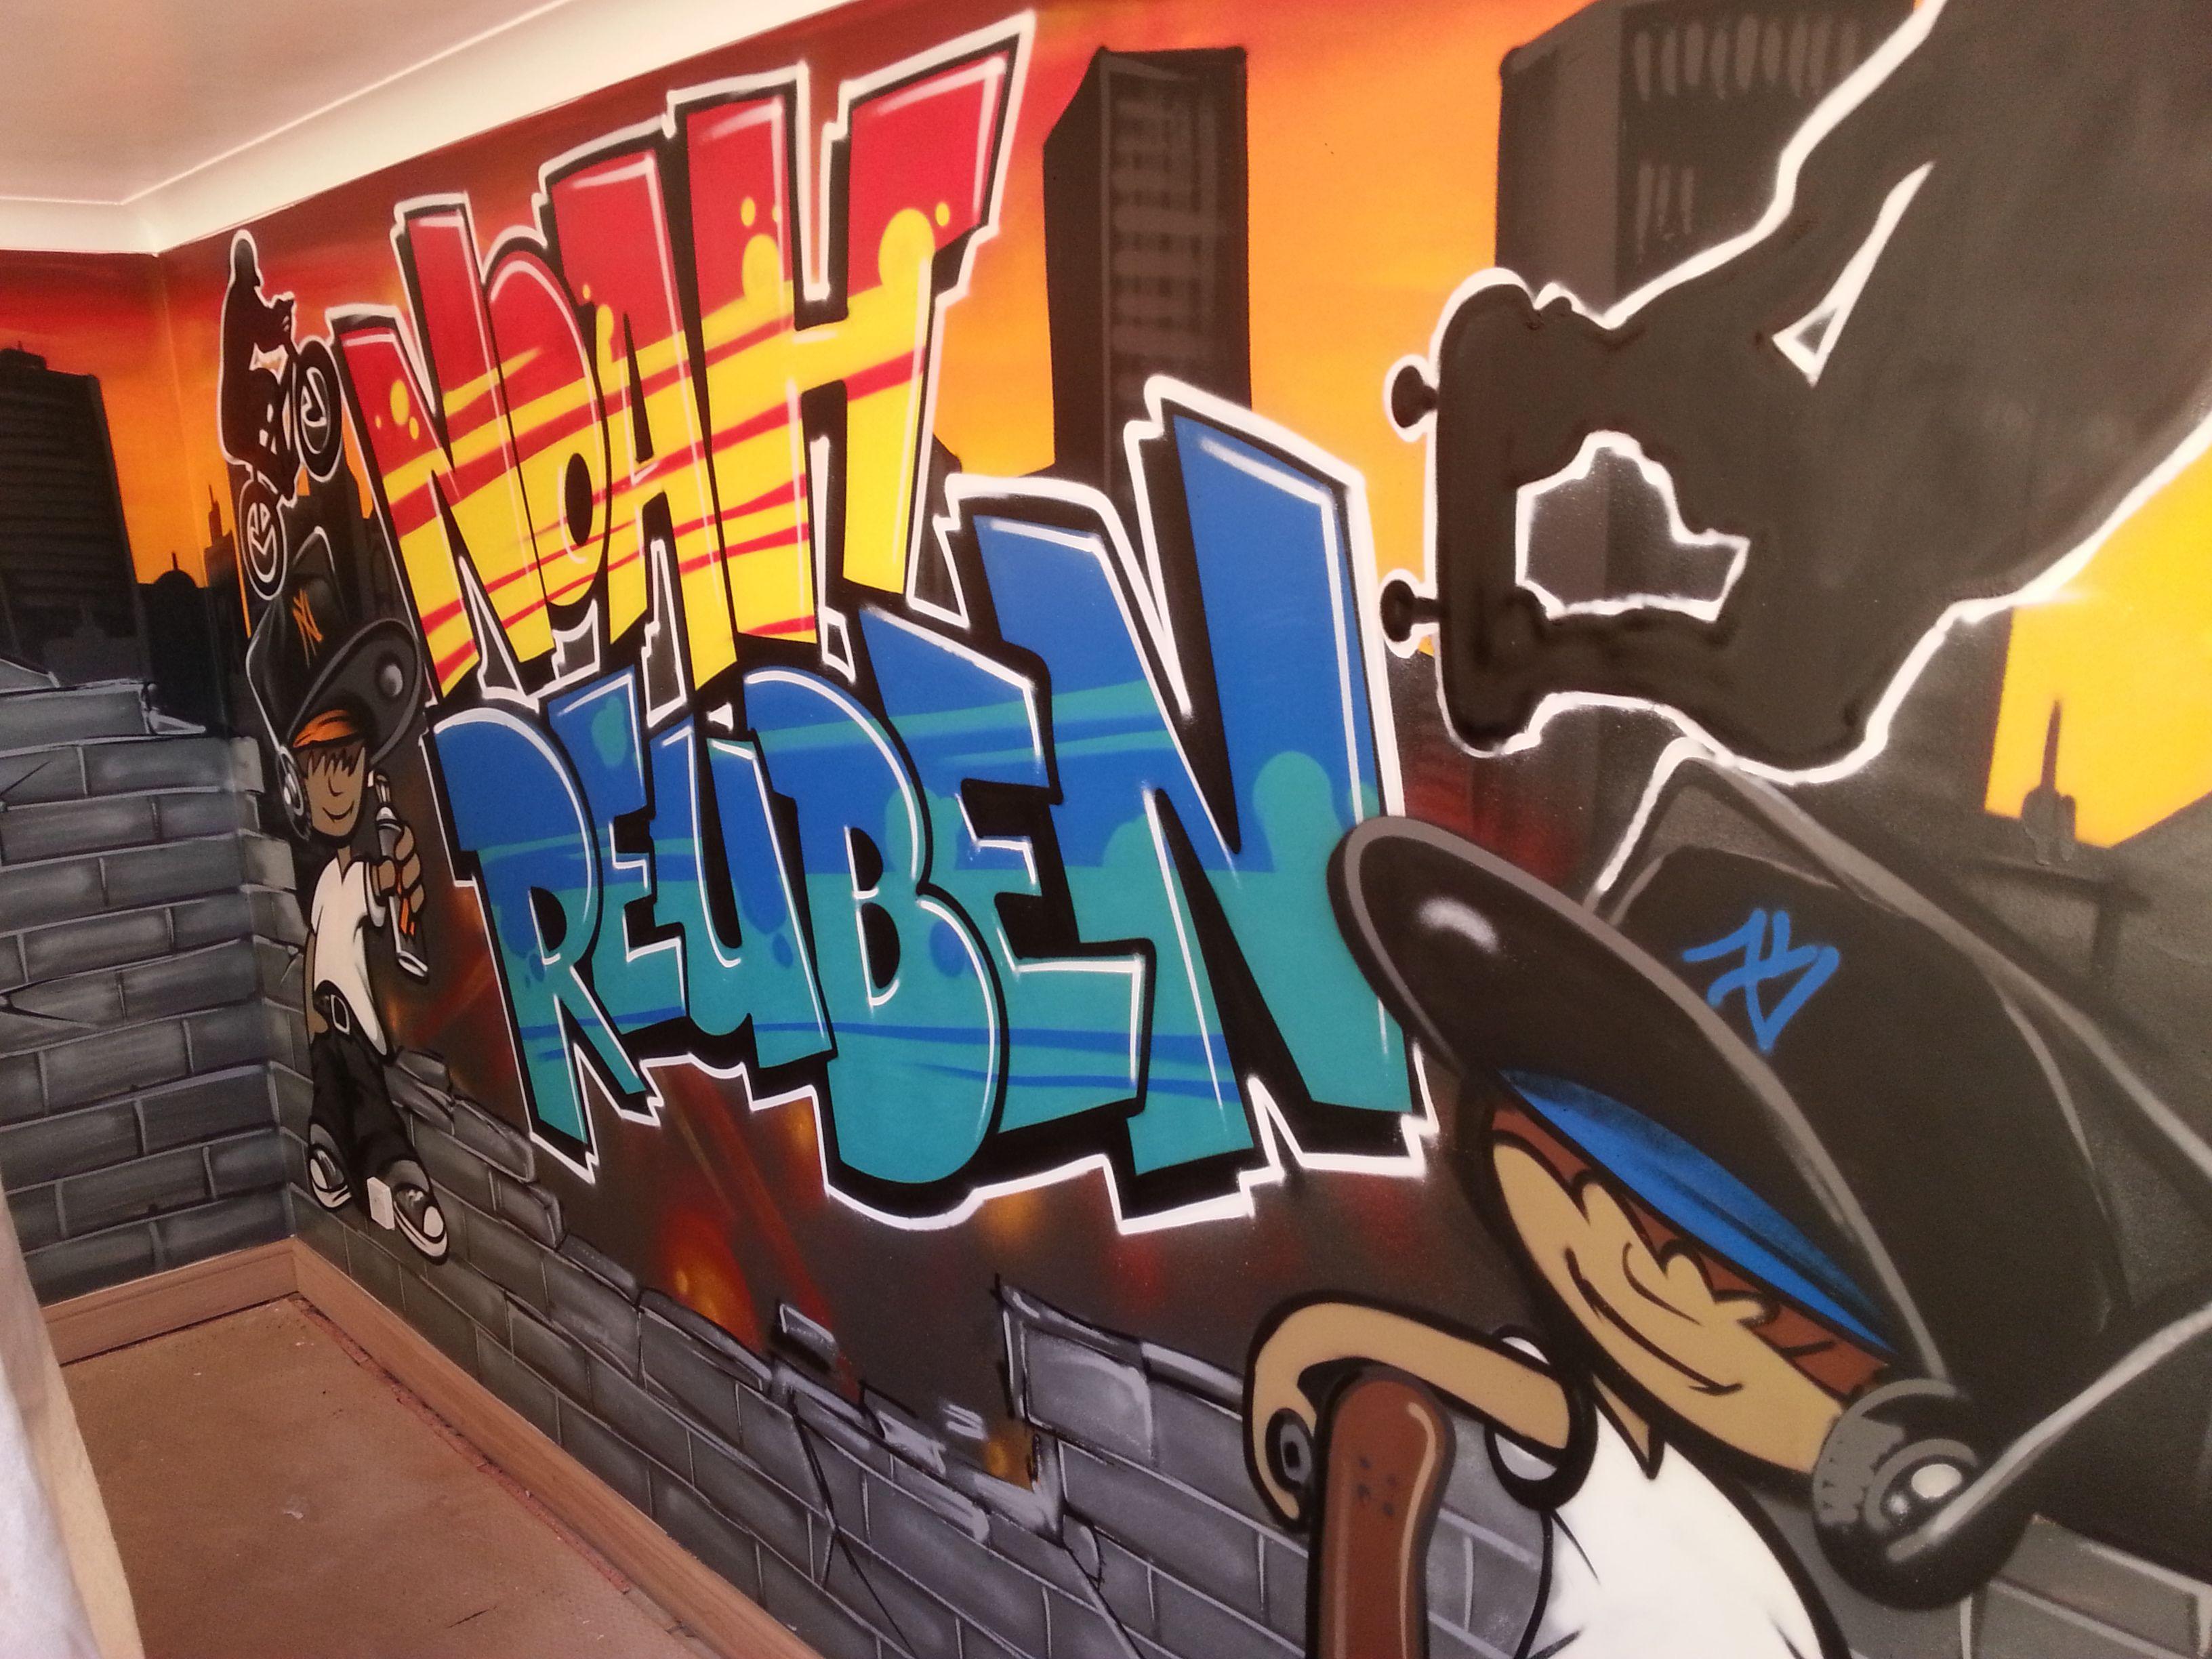 children / teen / Kids Bedroom Graffiti mural - hand painted Ollie wires graffiti  bedroom design #graffitibedroom #interior design | Graffiti Room ...